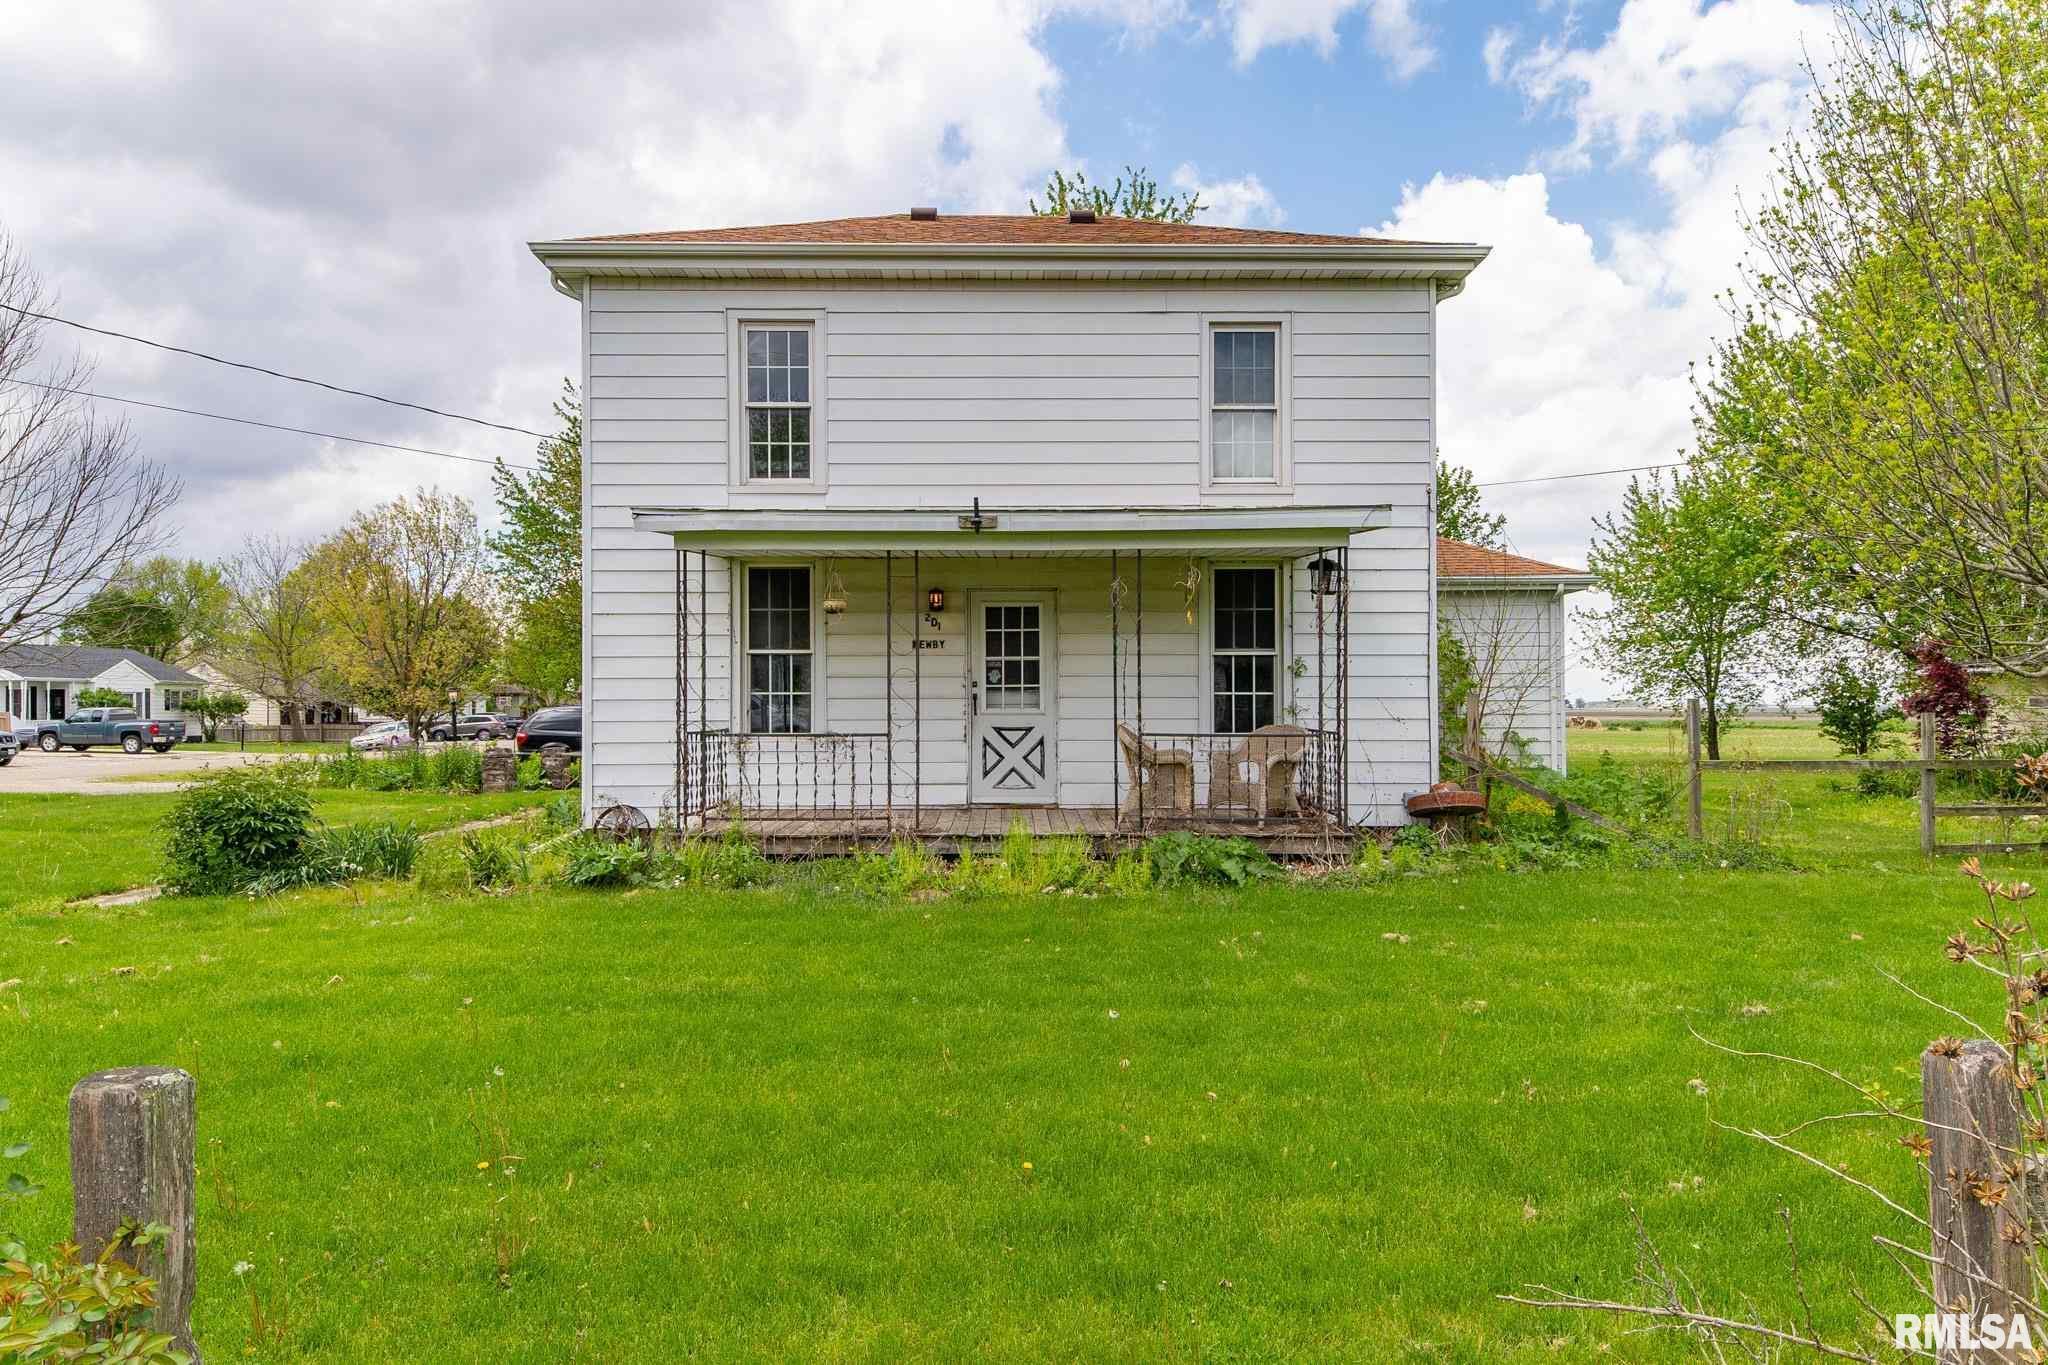 201 N 4TH Property Photo - Hartsburg, IL real estate listing